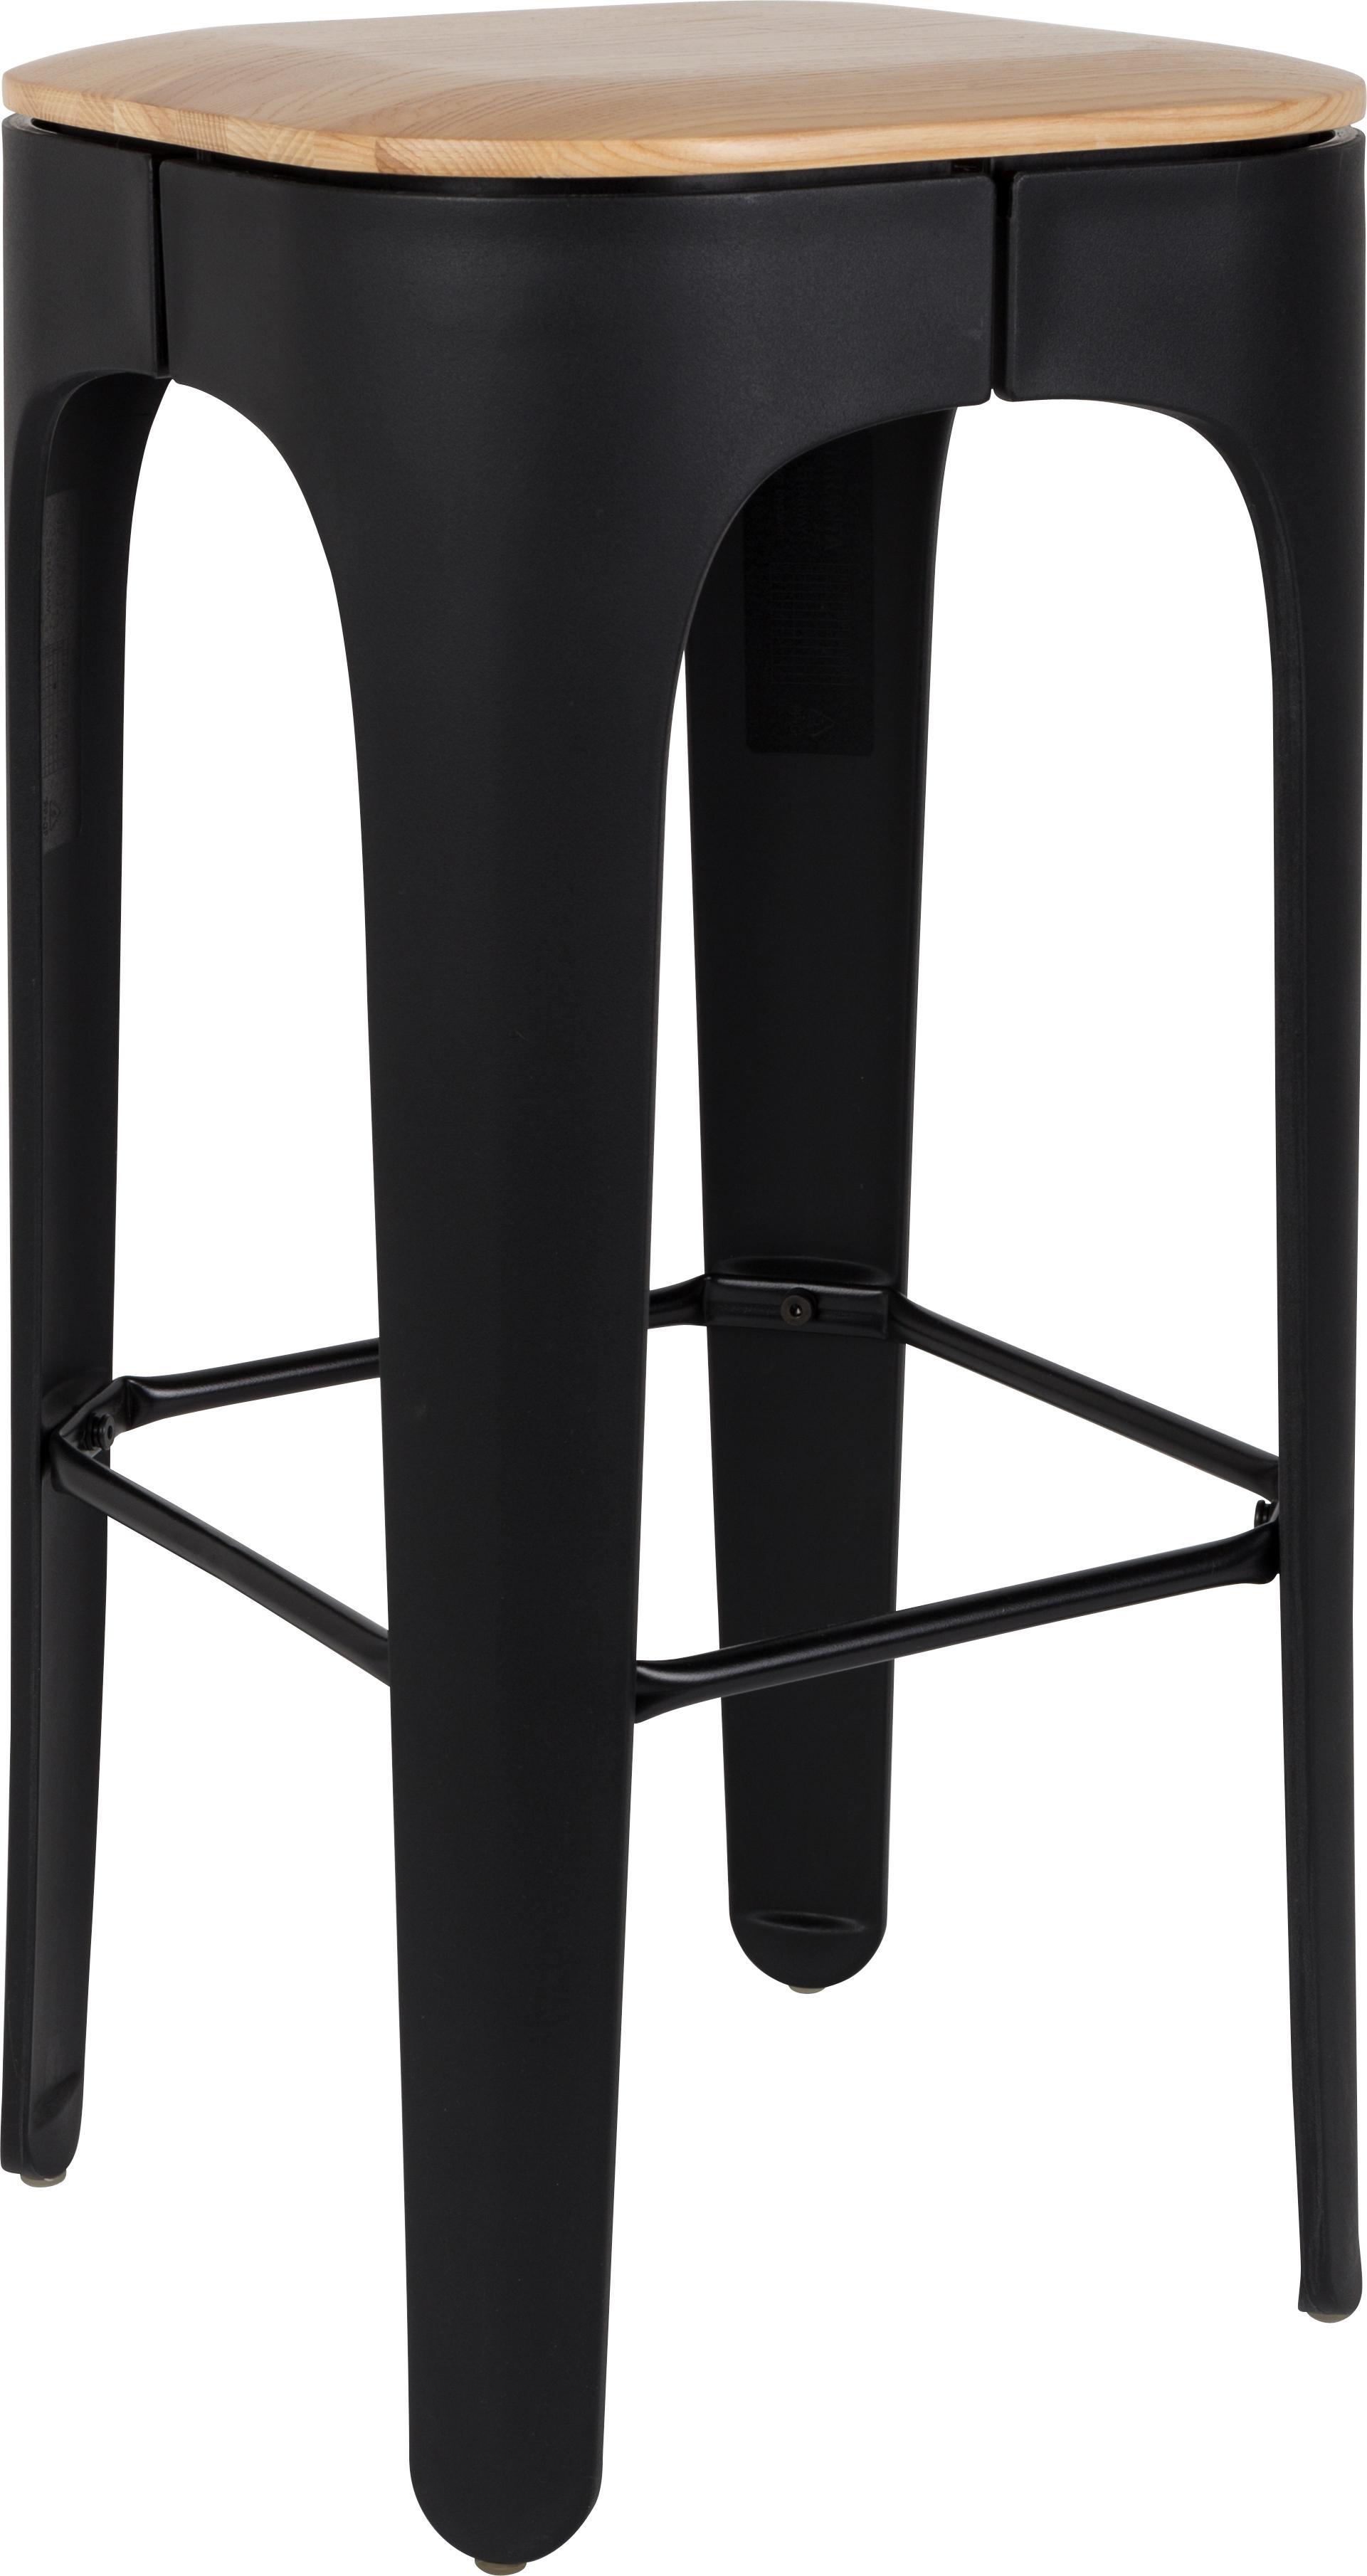 Sgabello da bar Up-High, Seduta: legno di frassino massicc, Gambe: polipropilene, opaco vern, Seduta: legno di frassino<br>Gambe: nero<br>Poggiapiedi: nero, L 35 x A 73 cm